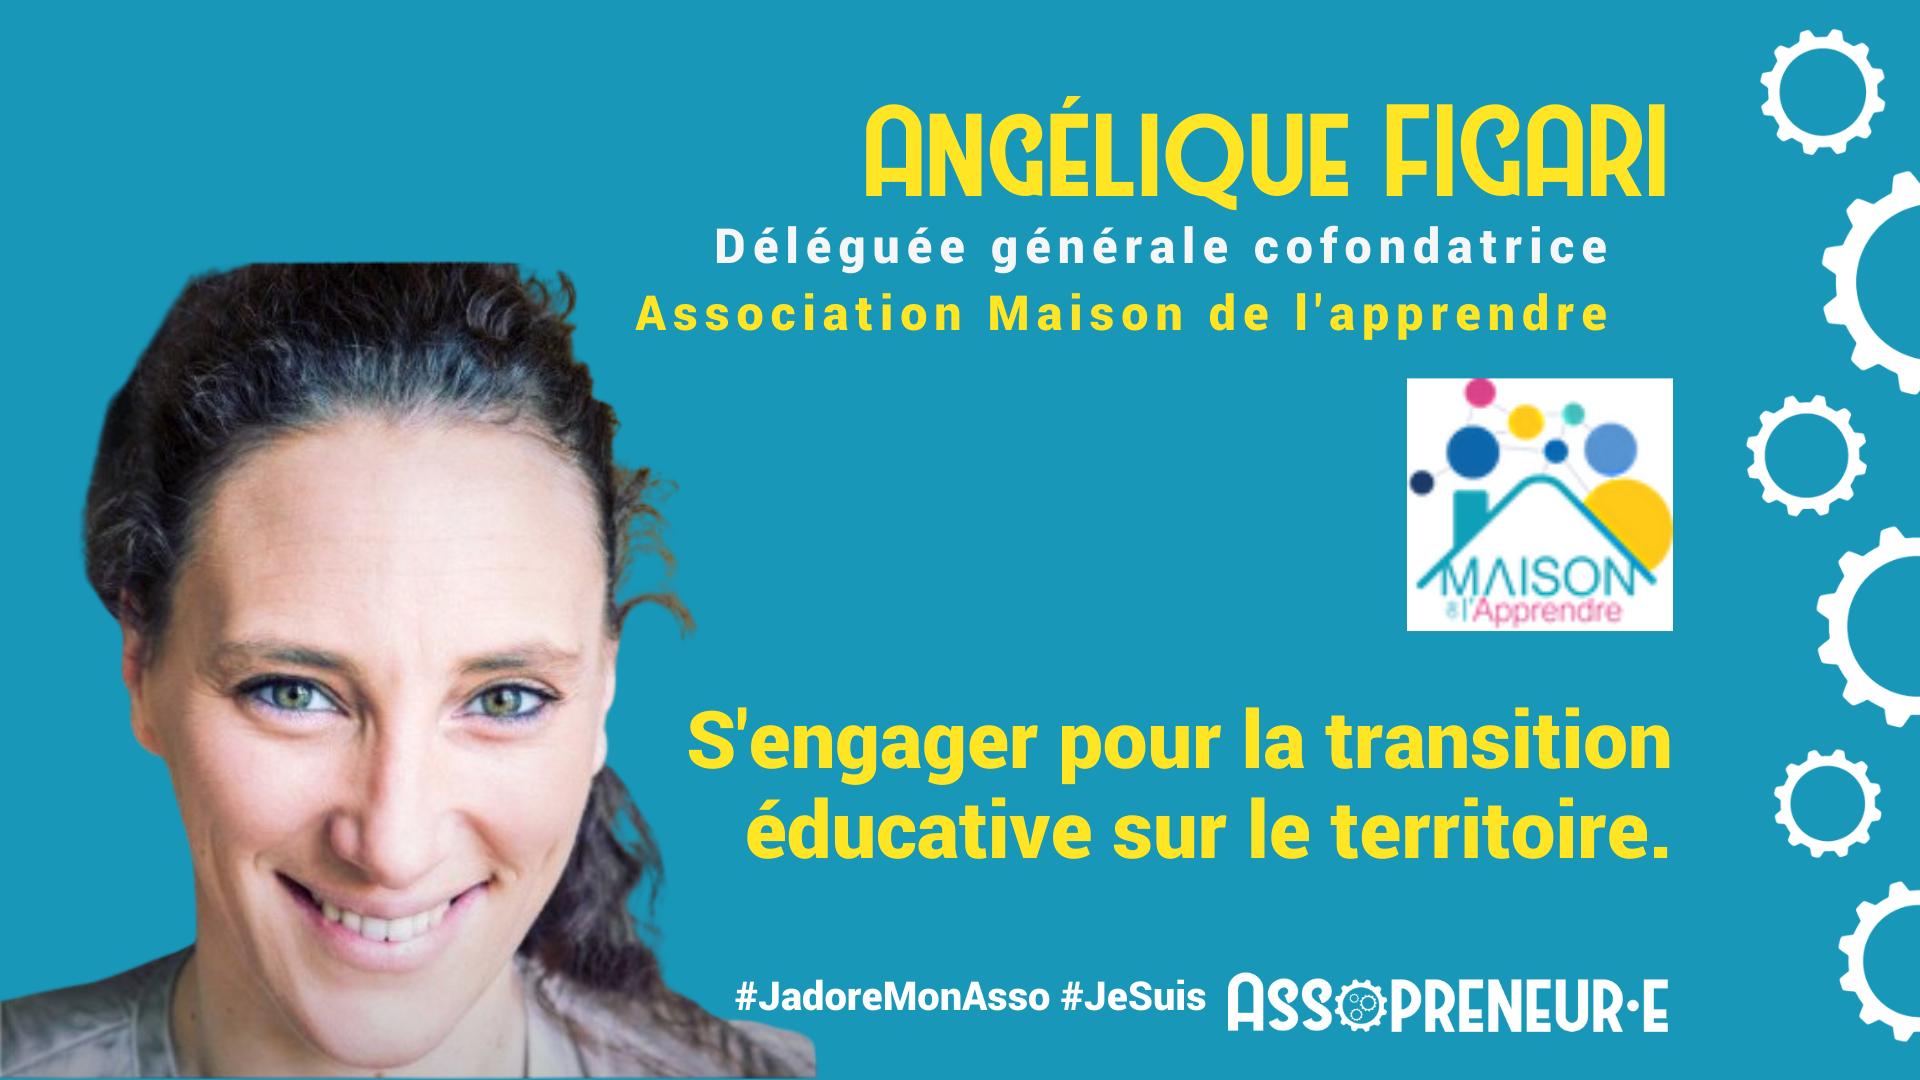 Angelique Figari membre programme assopreneur